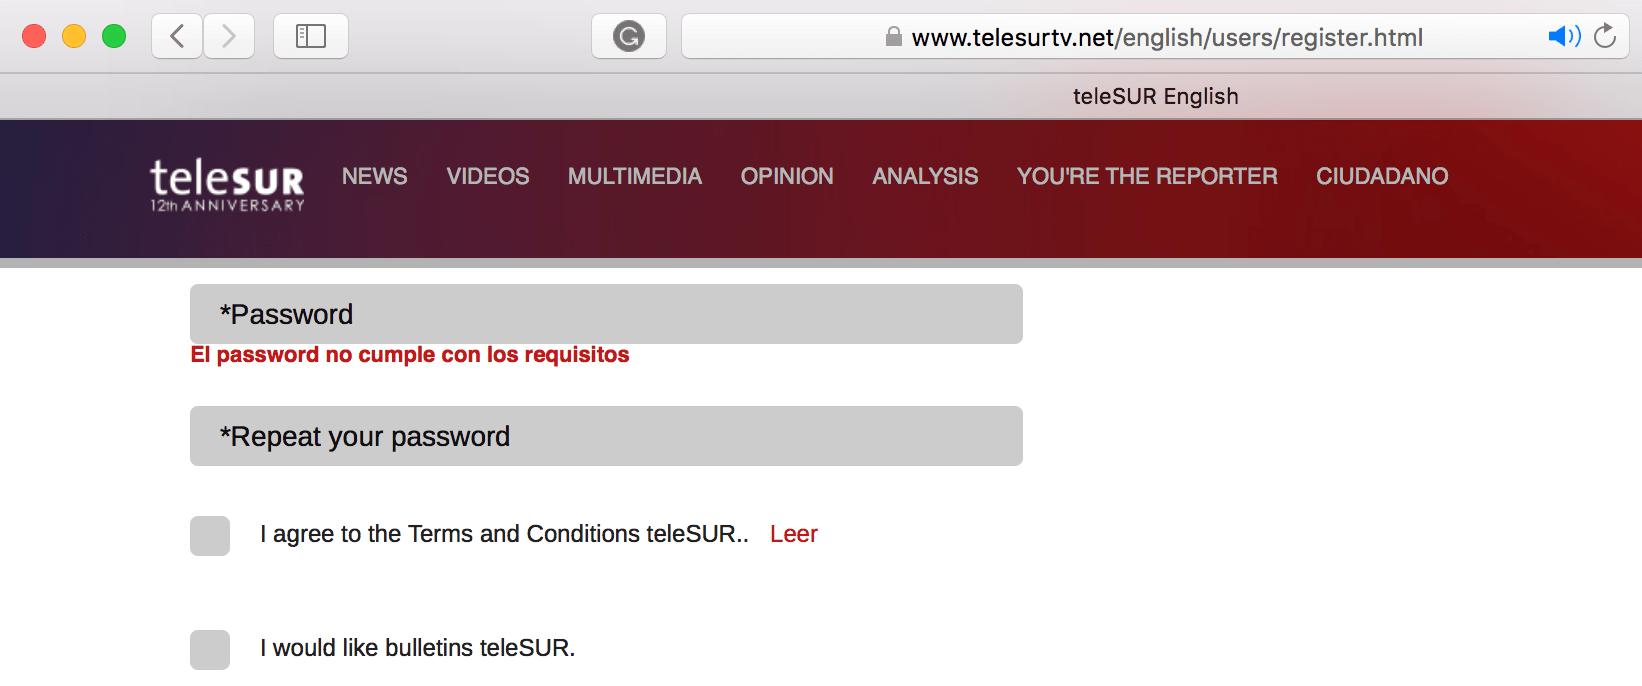 TeleSUR English: Onsite Audit Overview – Ariel Sheen